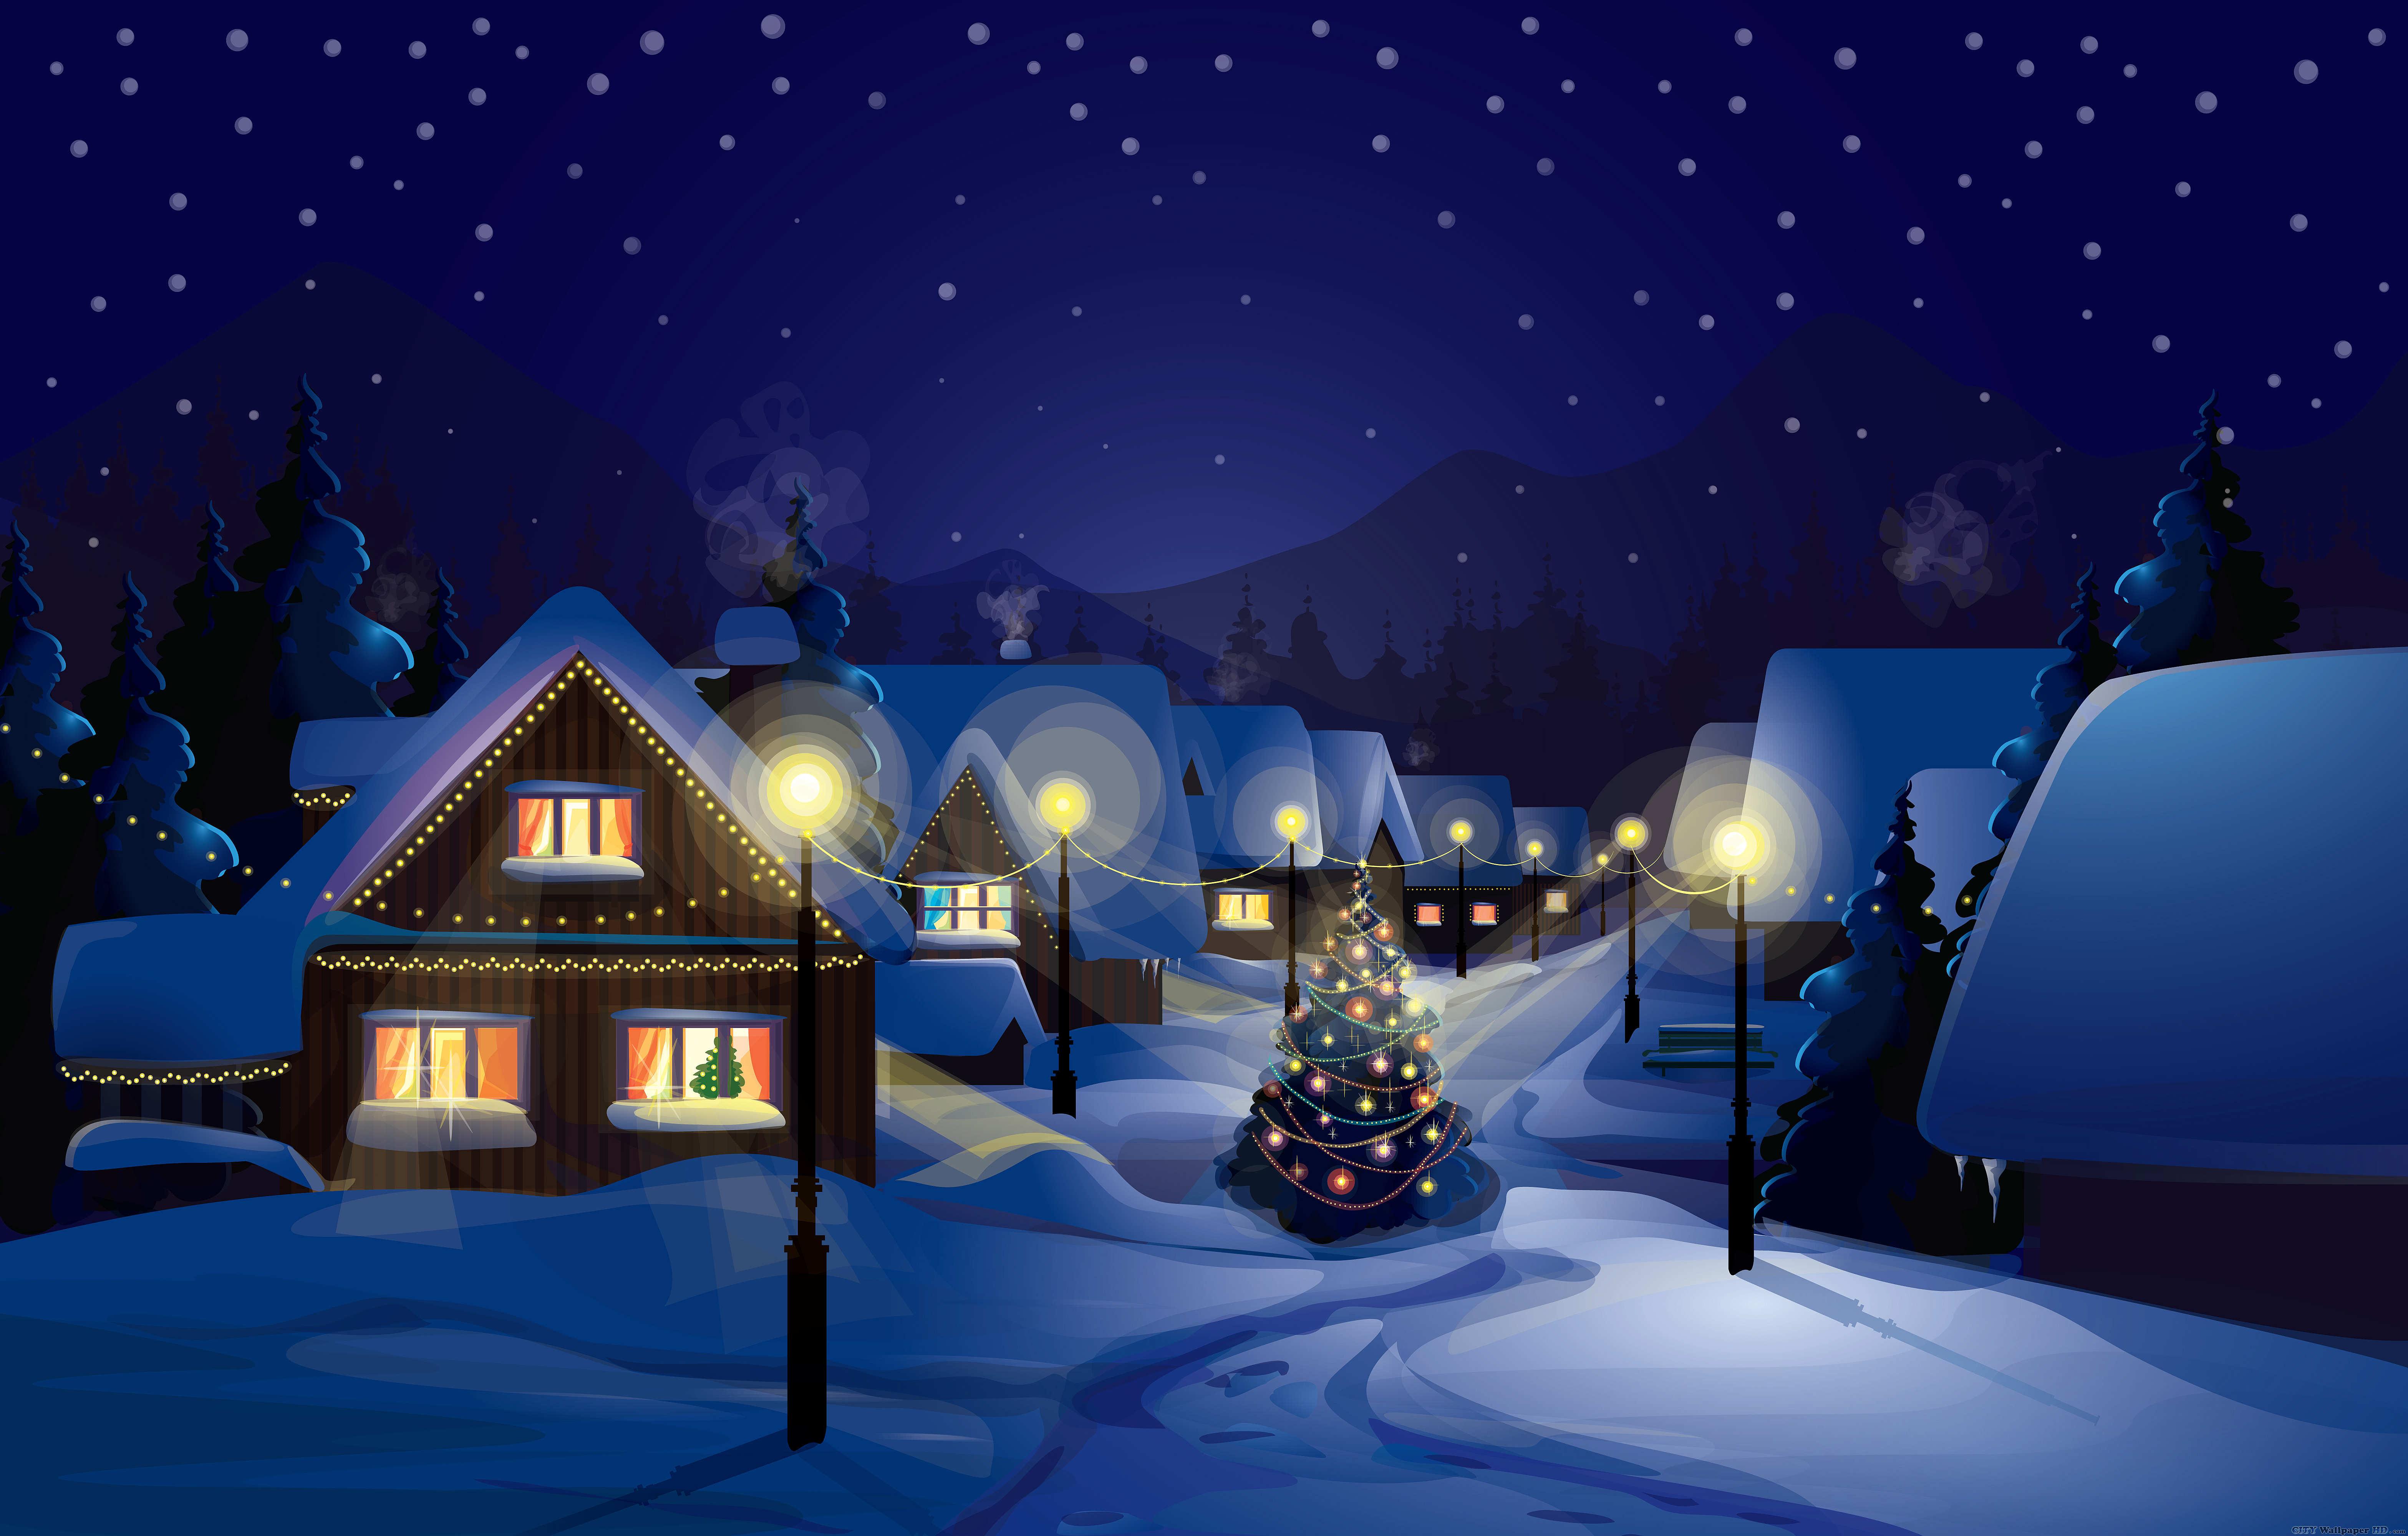 christmas night wallpaper,winter,snow,blue,christmas eve,sky